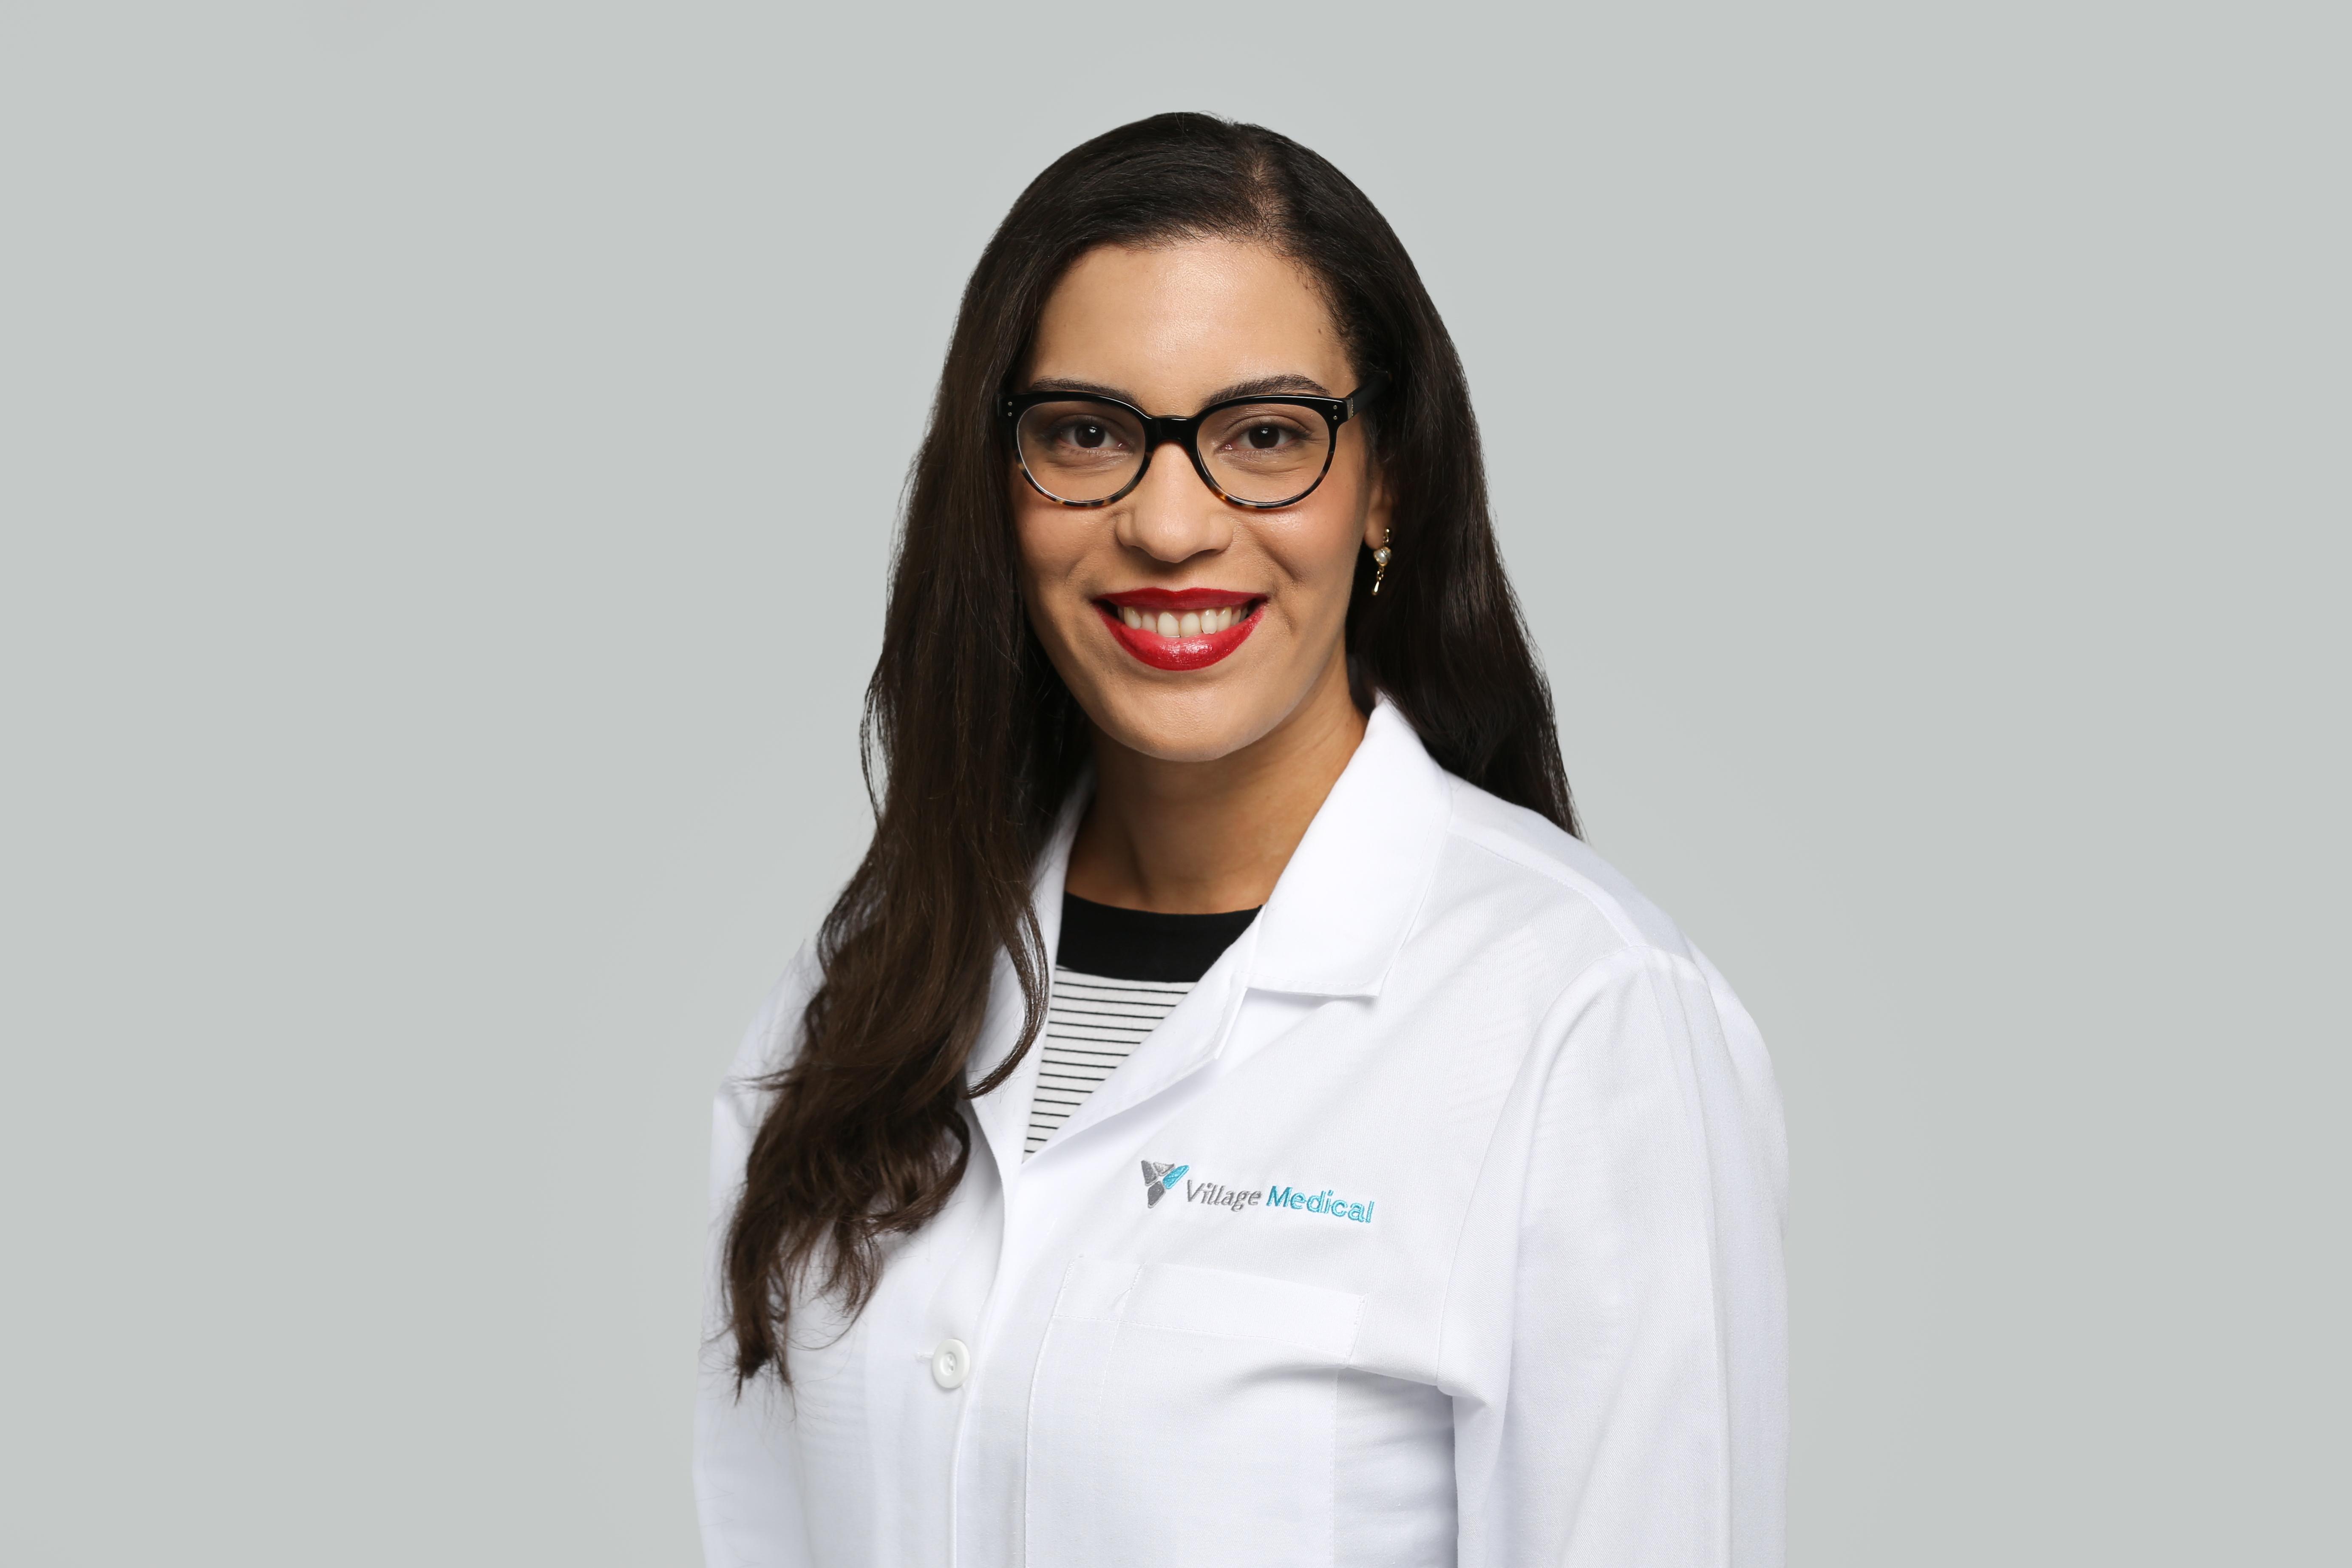 Bianca Persaud, MD